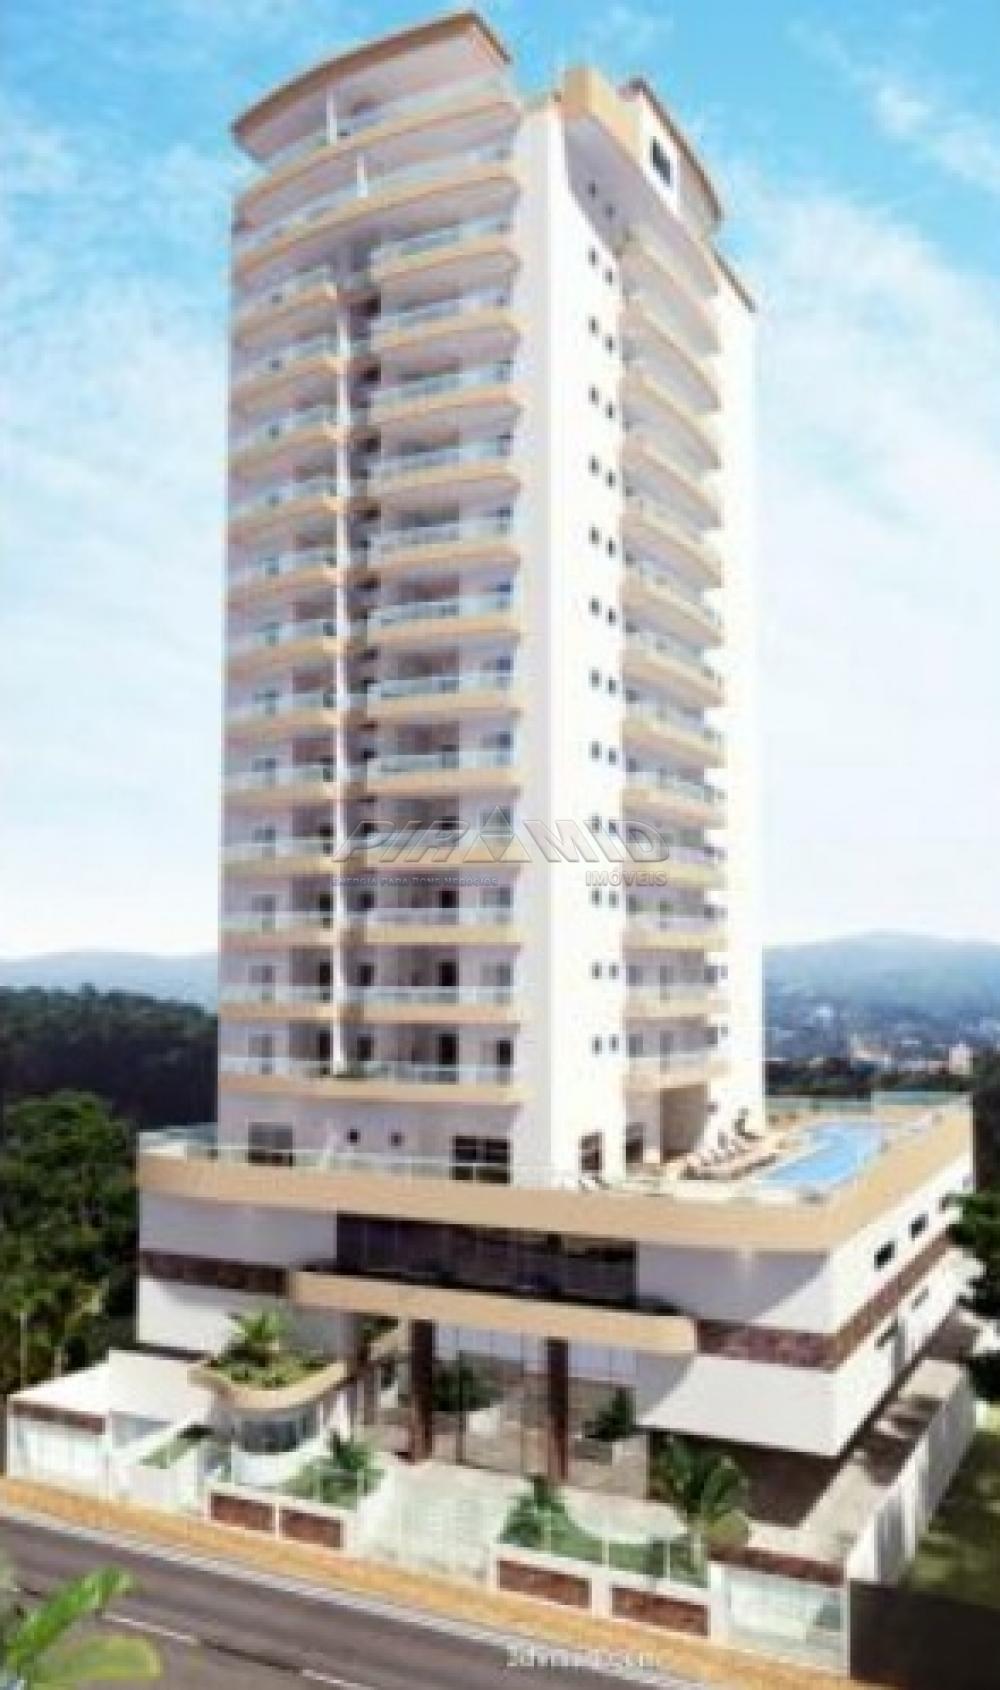 Praia Grande Campo da Aviacao Apartamento Venda R$460.000,00 Condominio R$480,00 2 Dormitorios 2 Vagas Area construida 78.00m2